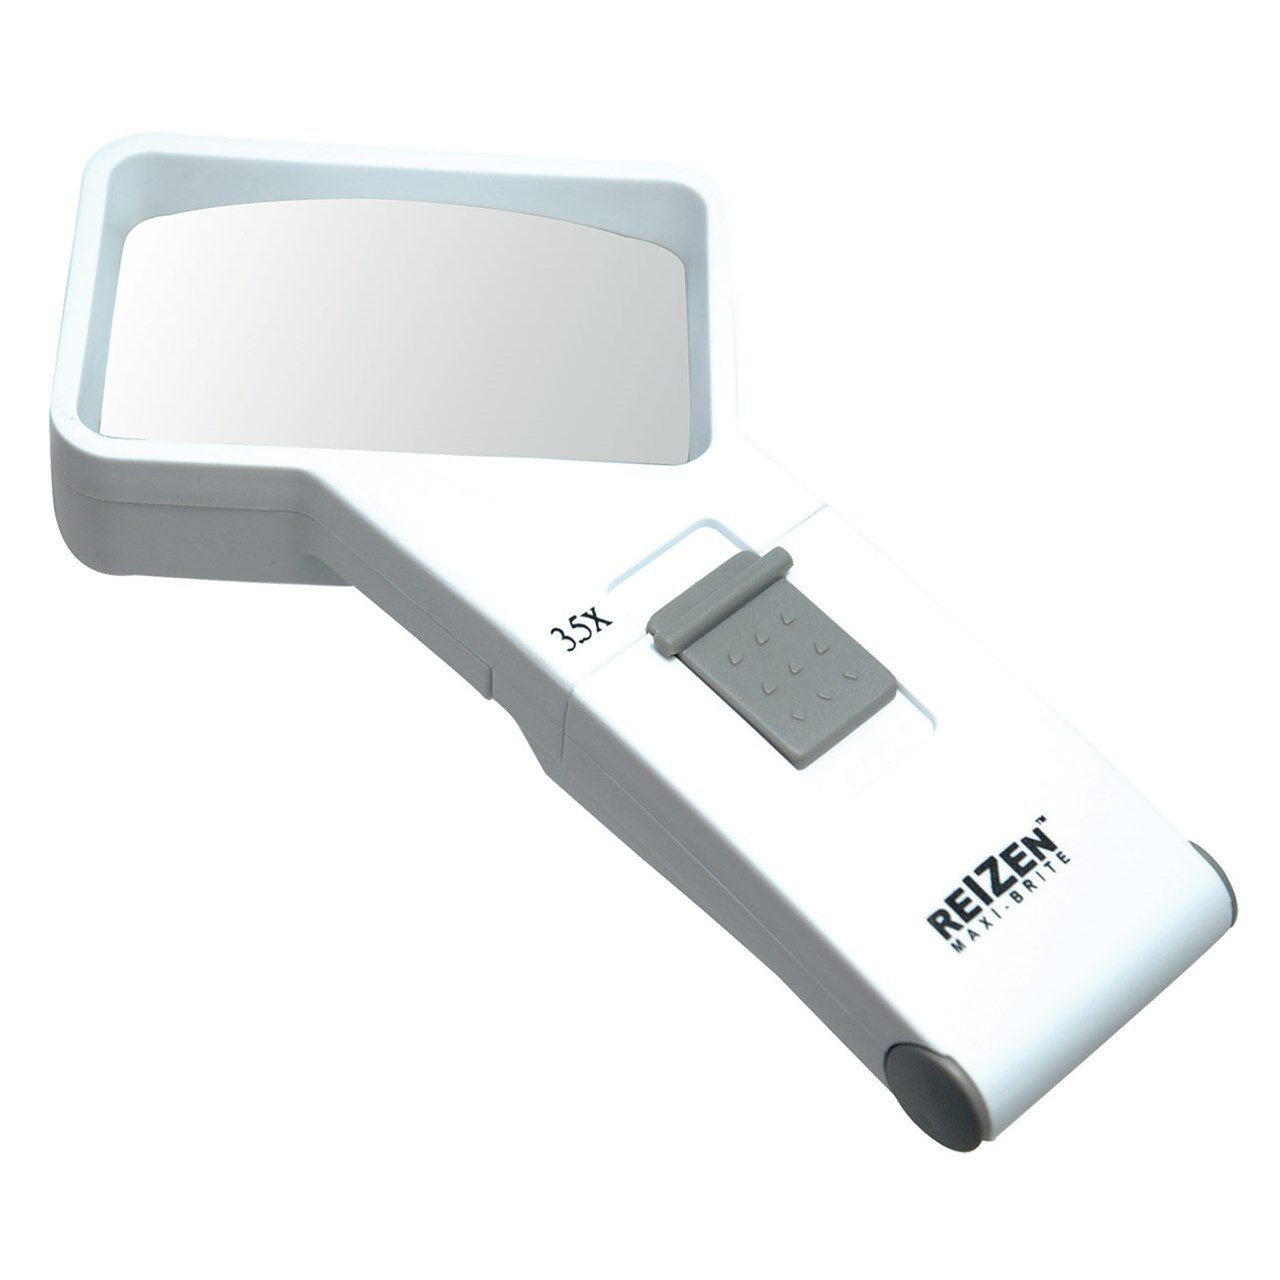 REIZEN 3.5X Illuminated Pocket Magnifier